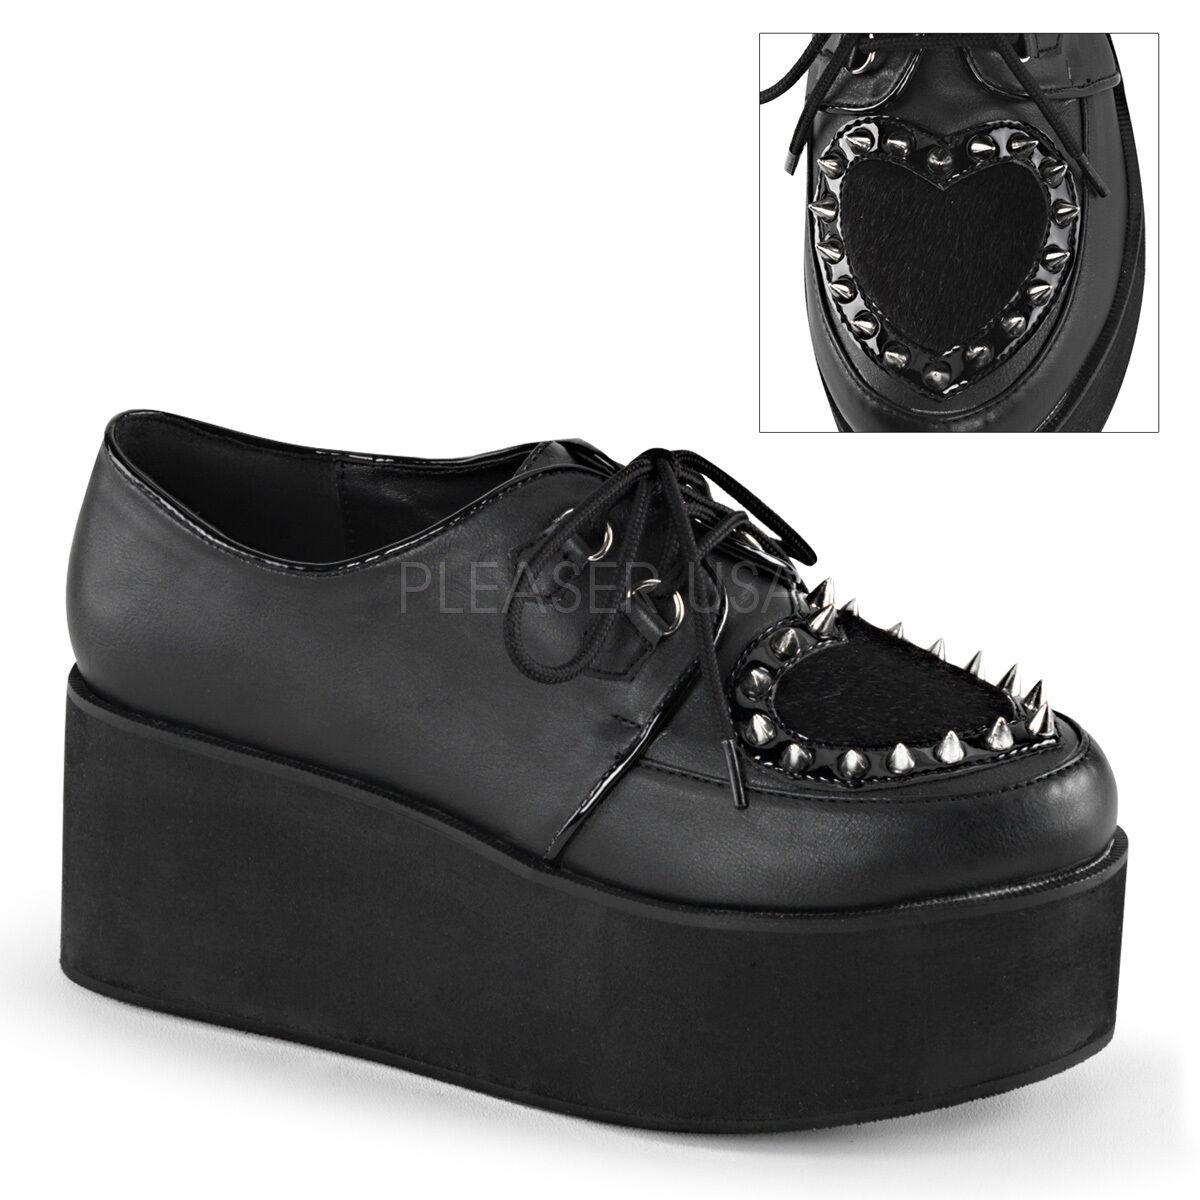 Demonia 2.75  Platform Vegan Furry Heart Spike Studded shoes Goth Women's 6-11